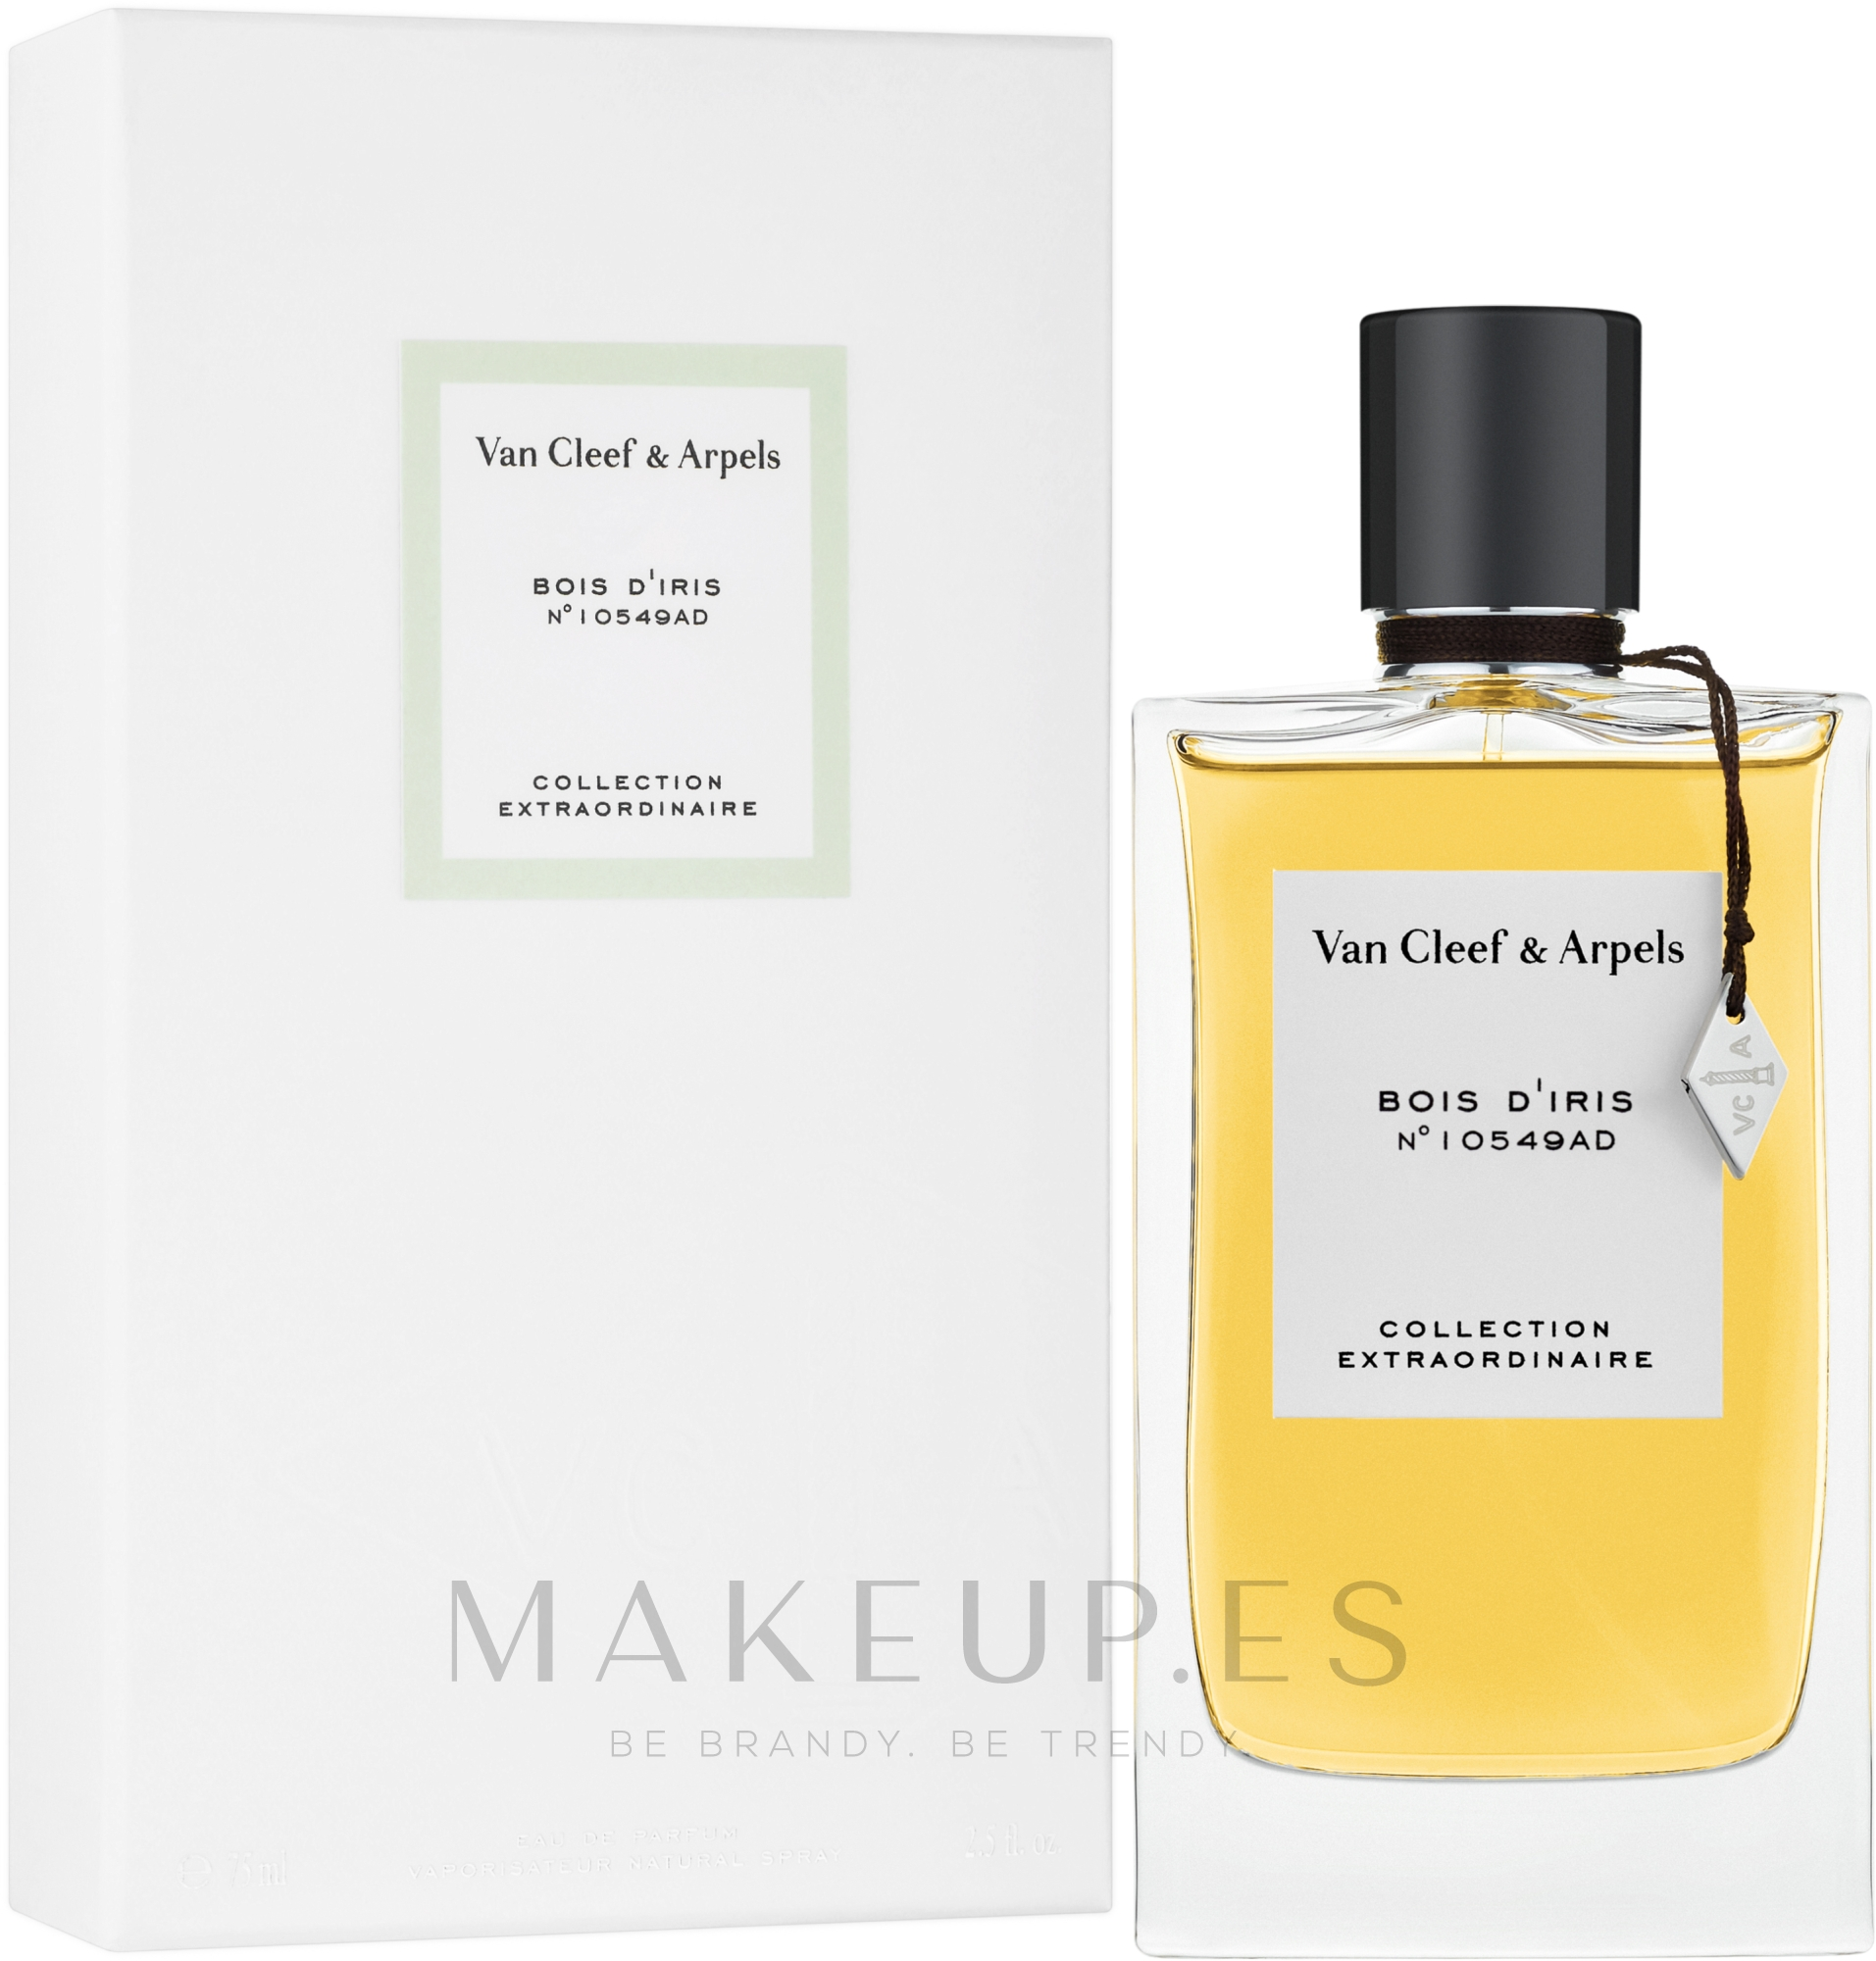 Van Cleef & Arpels Collection Extraordinaire Bois D'Iris - Eau de parfum — imagen 75 ml